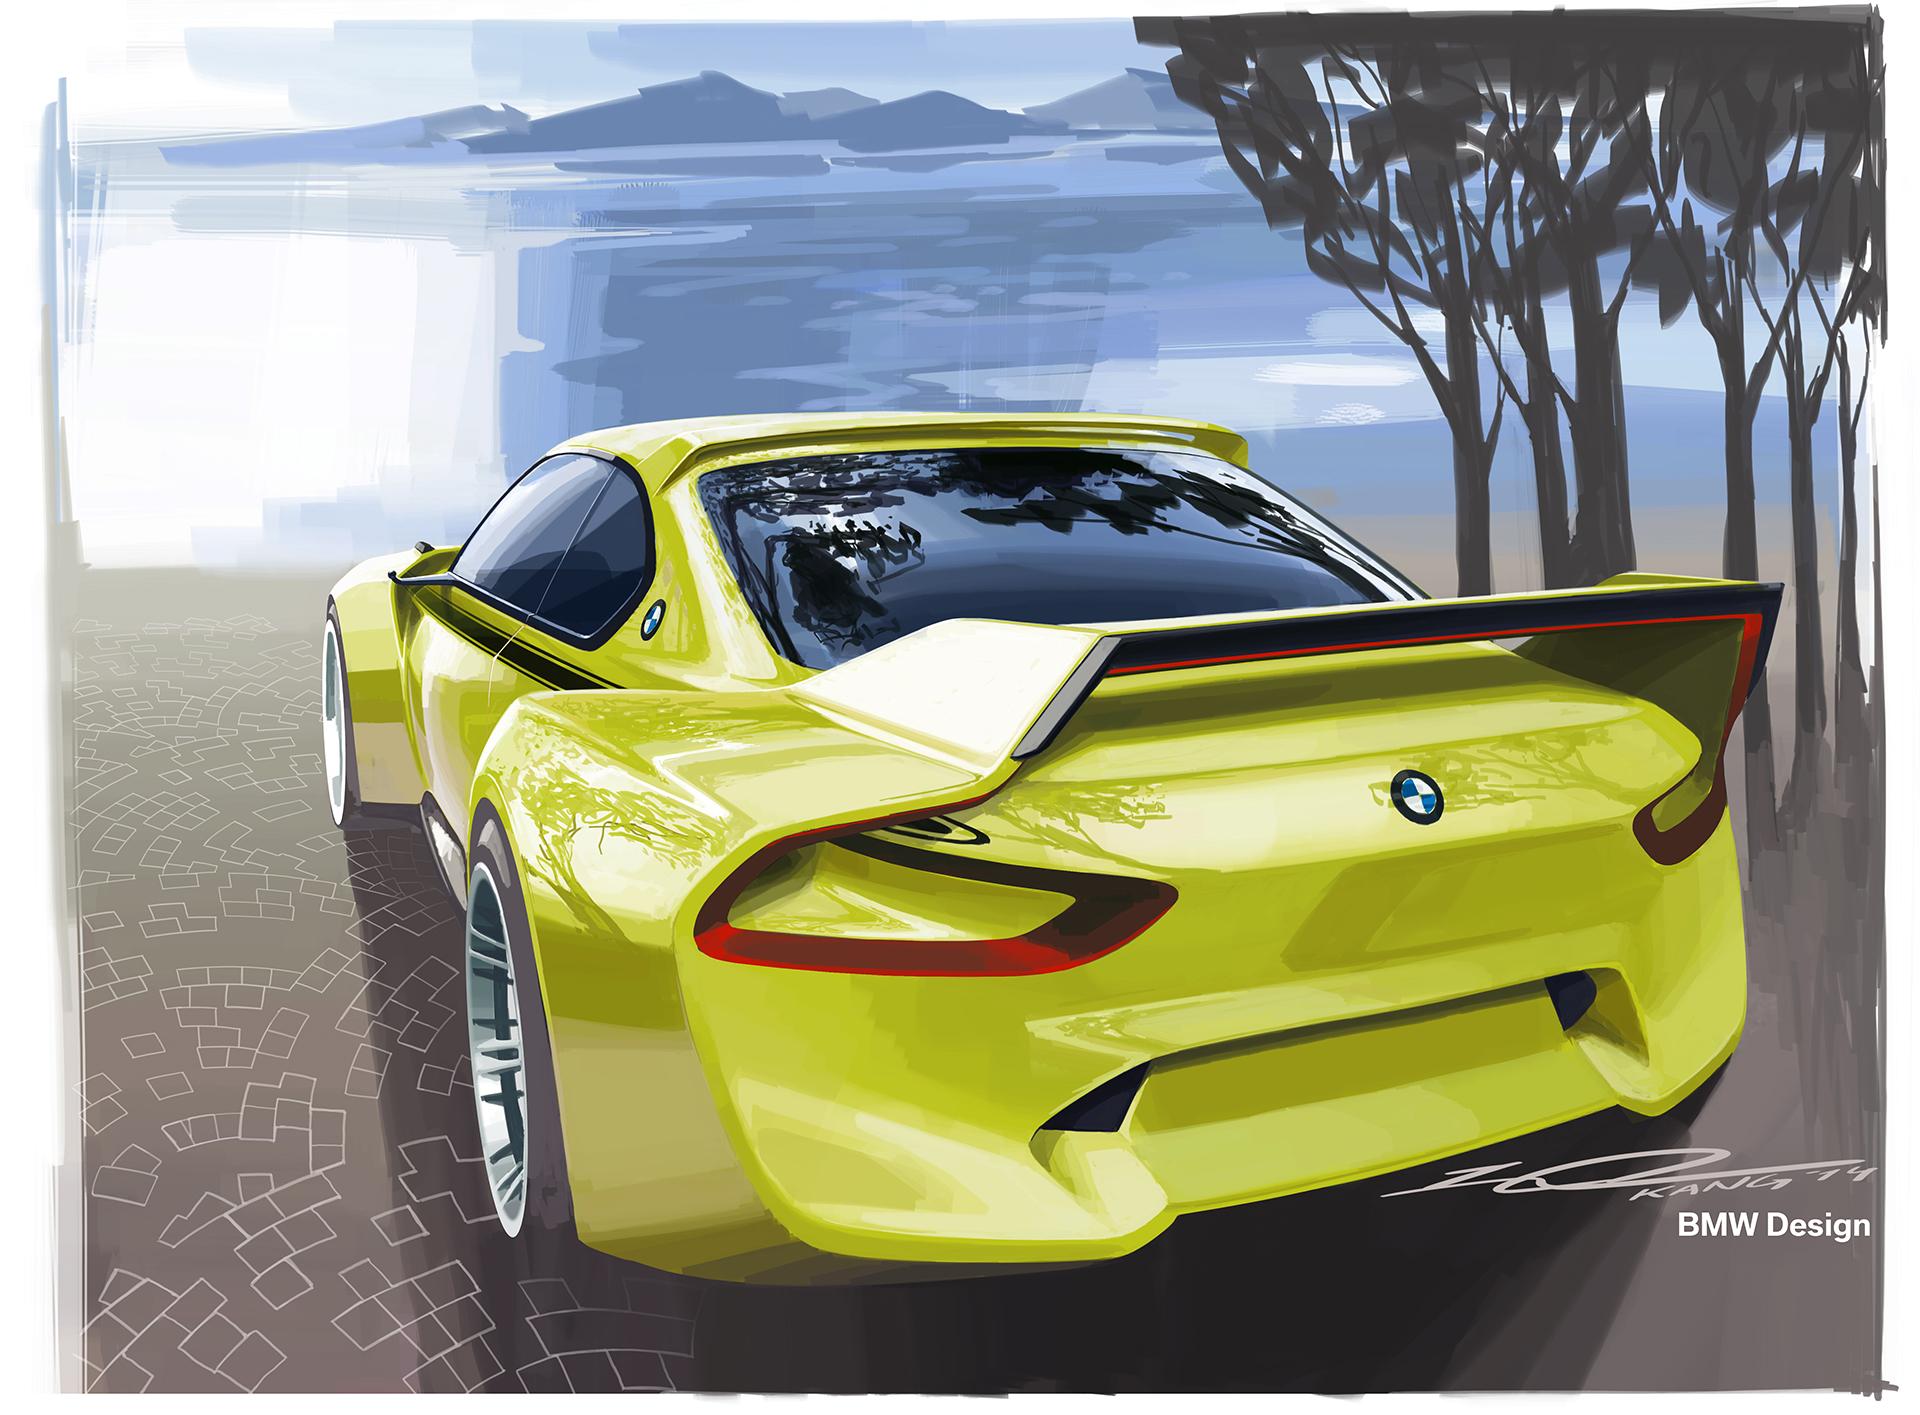 BMW 3.0 CSL Hommage - sketch rear